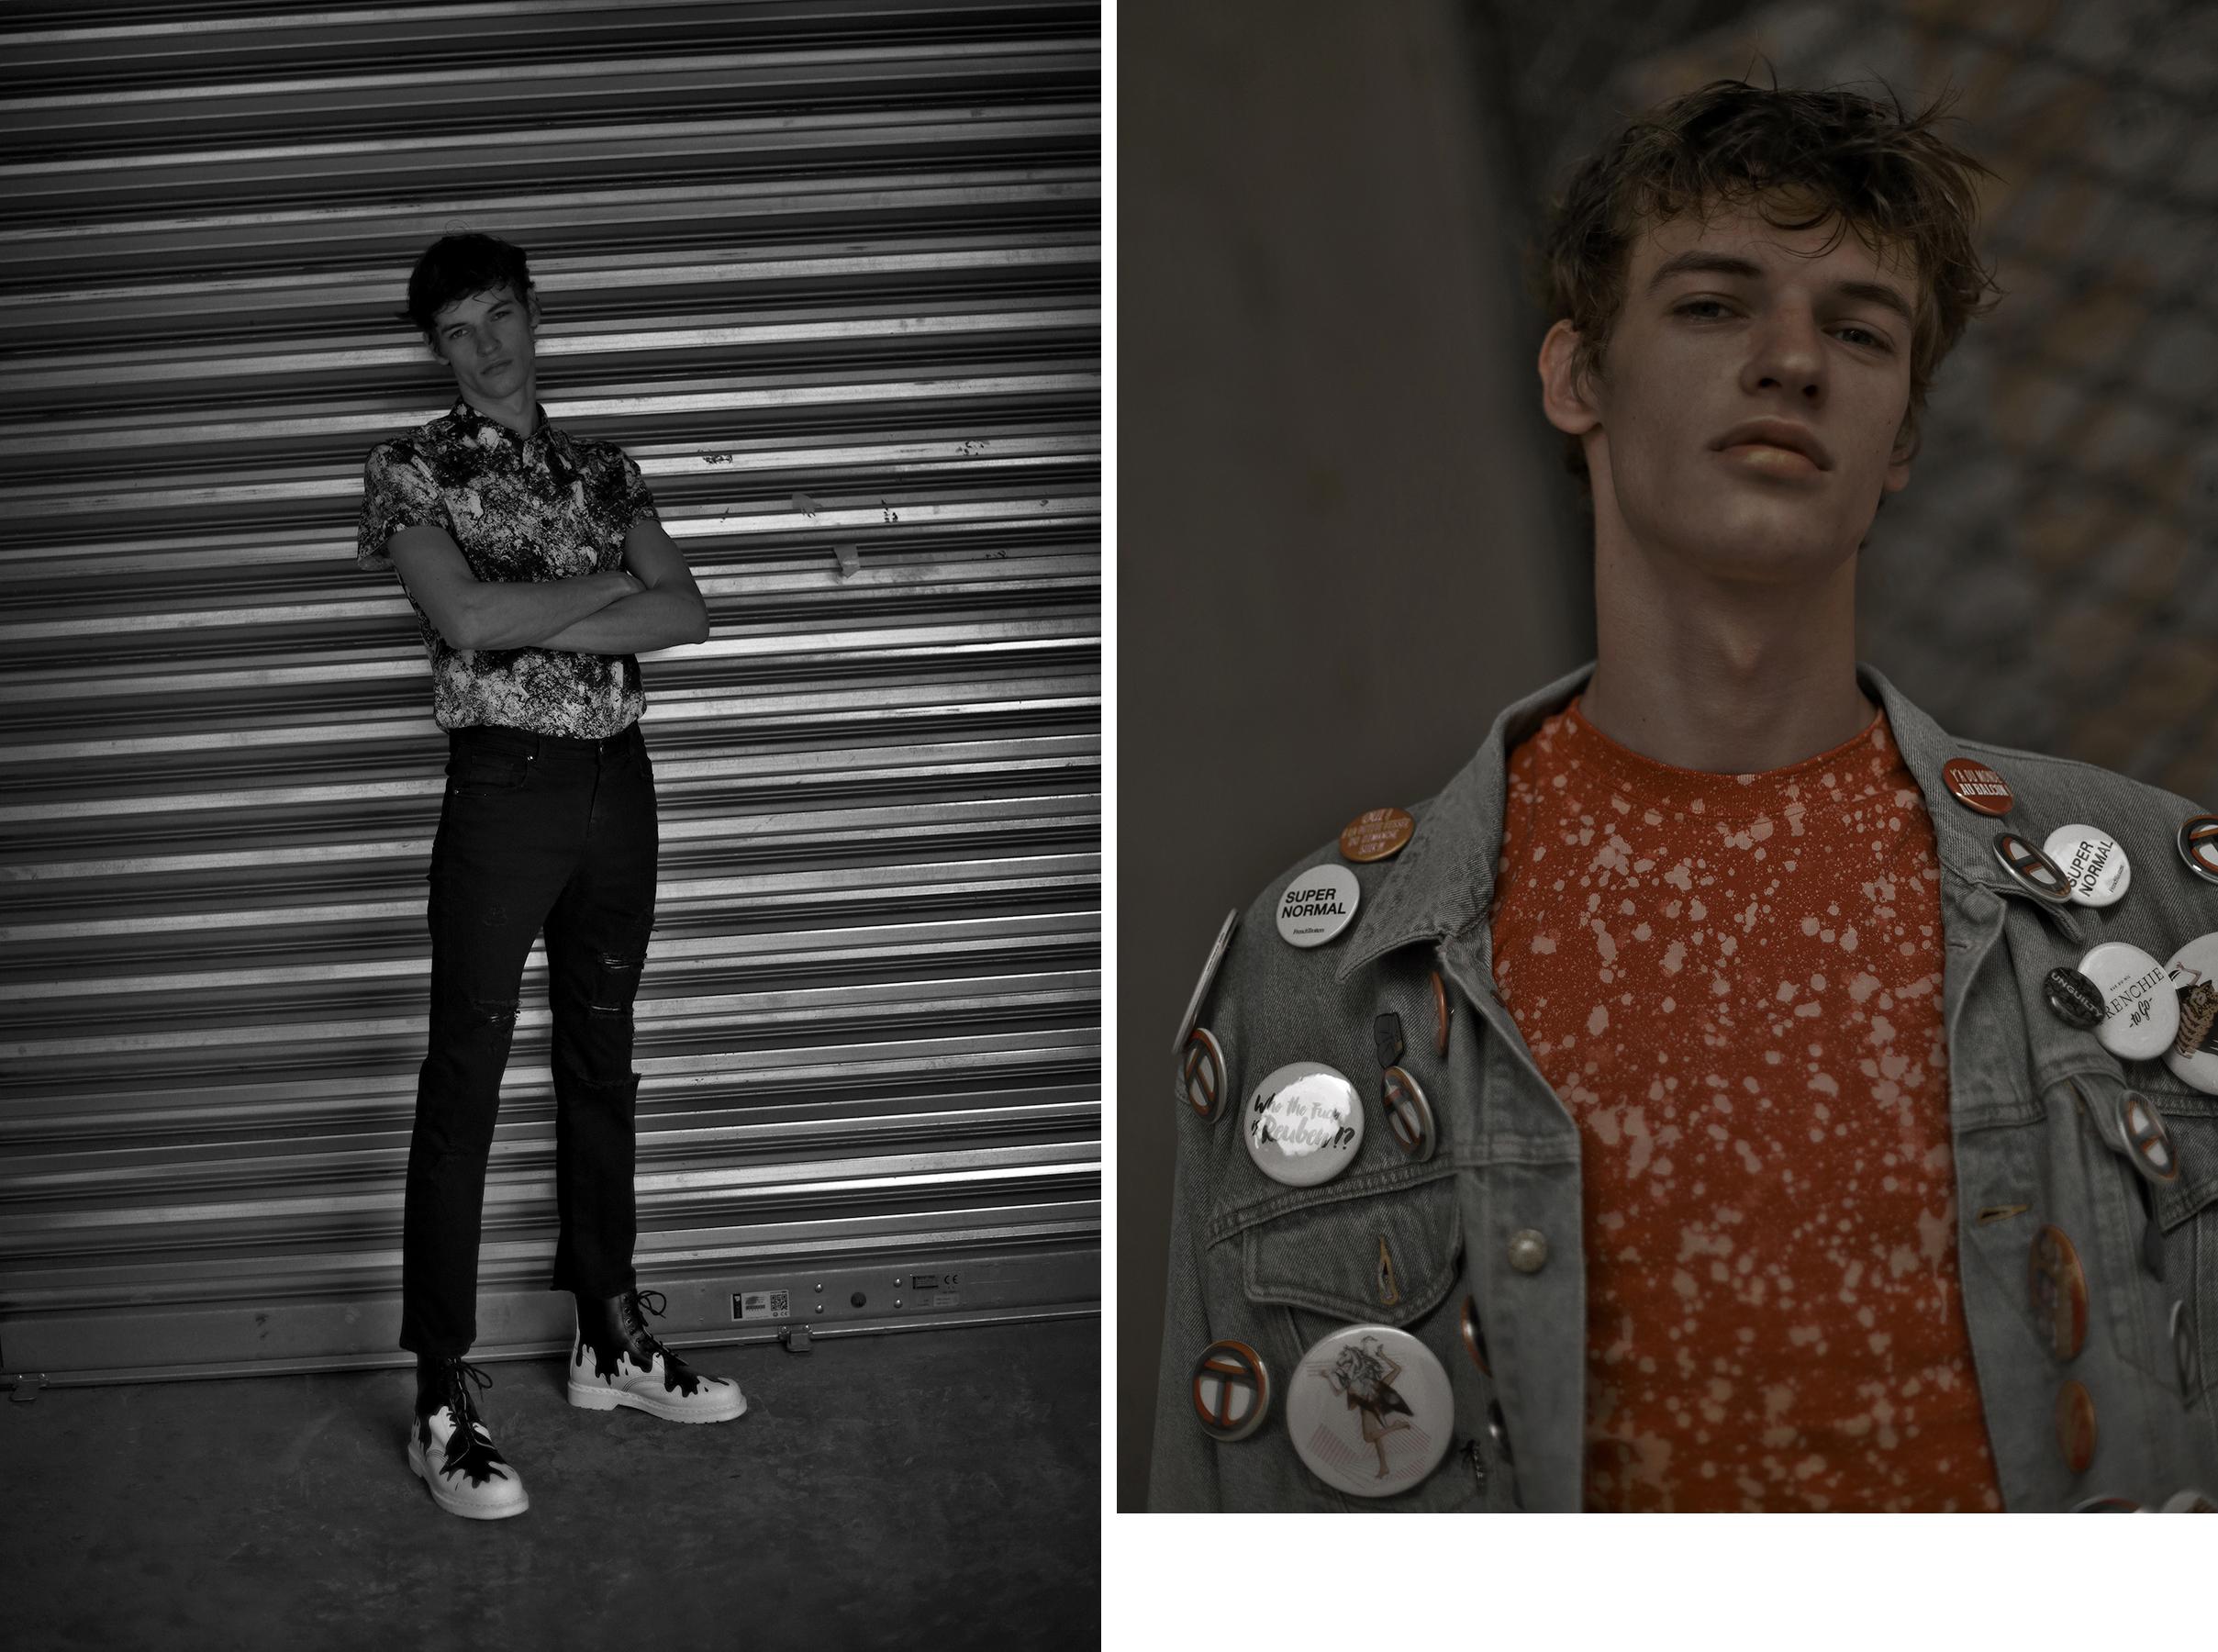 zygis-linda-lateb-menswear-fashion-editorial-punk-style-80s